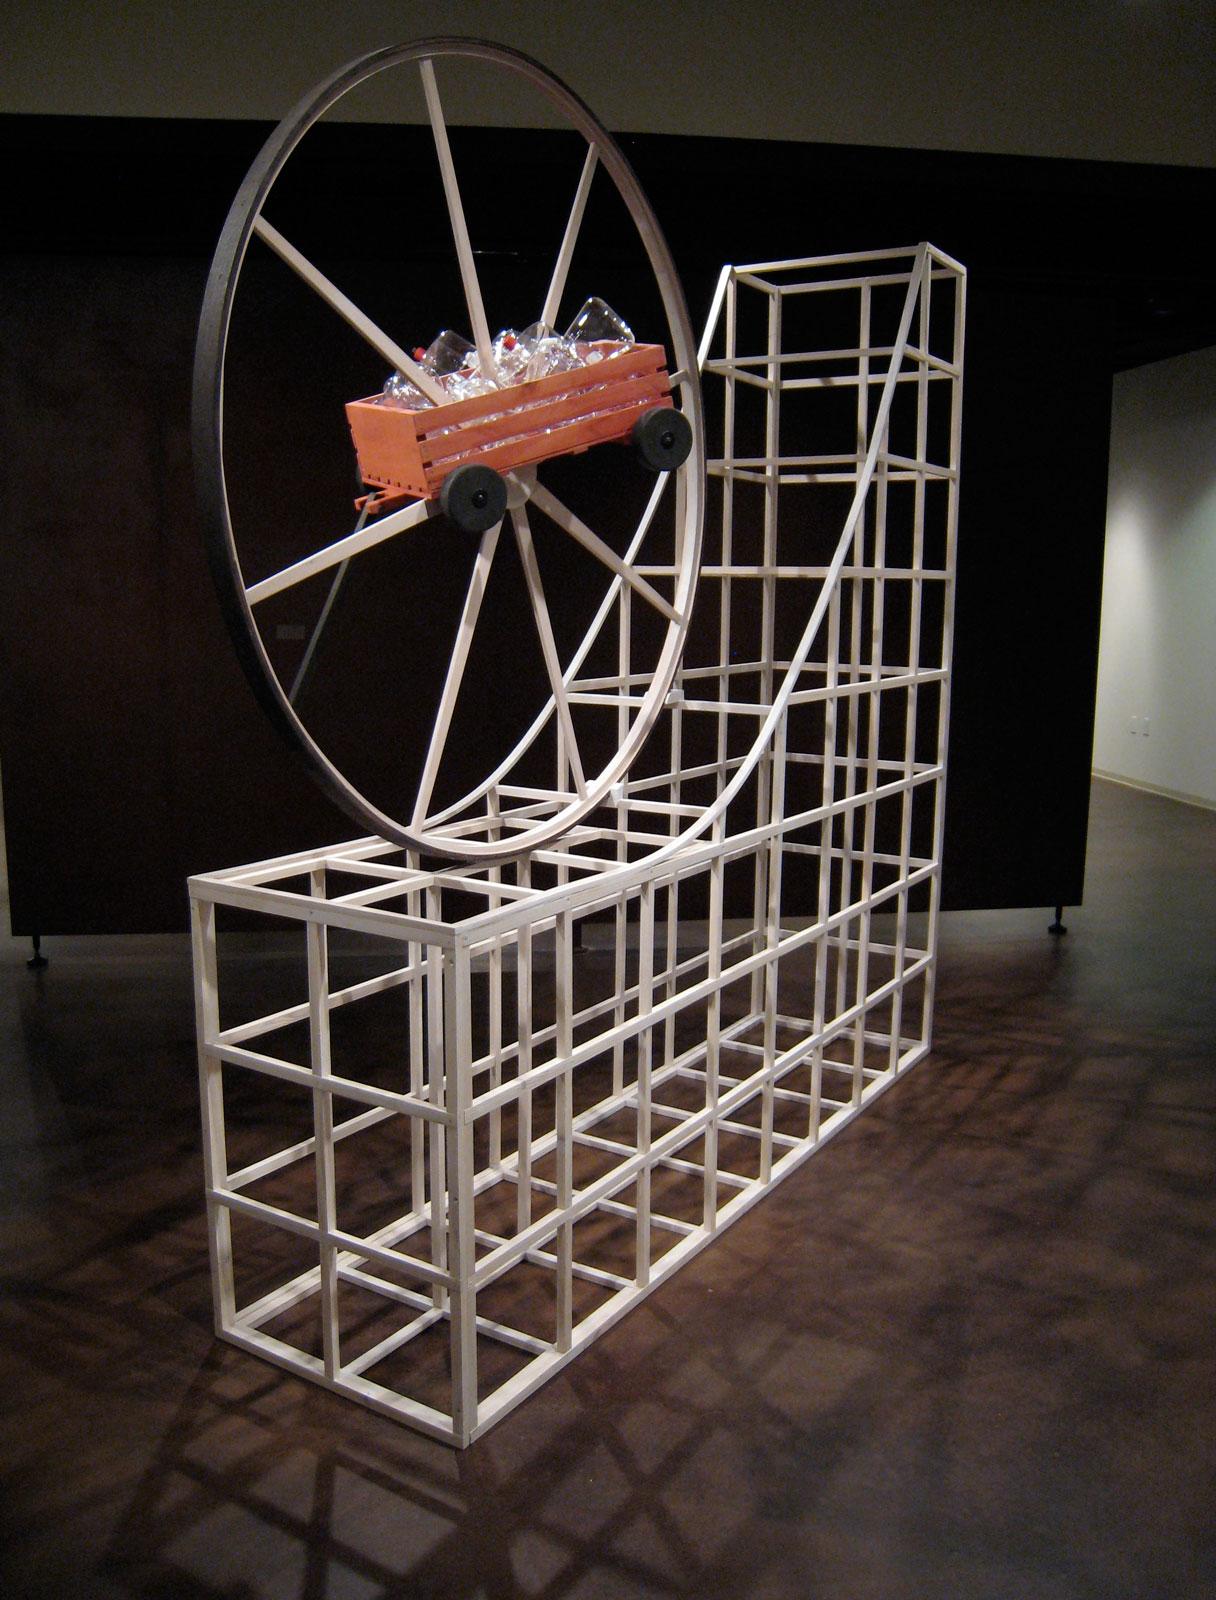 sculpture-tom-gormally-launch-bellevue-college-art-gallery.jpg